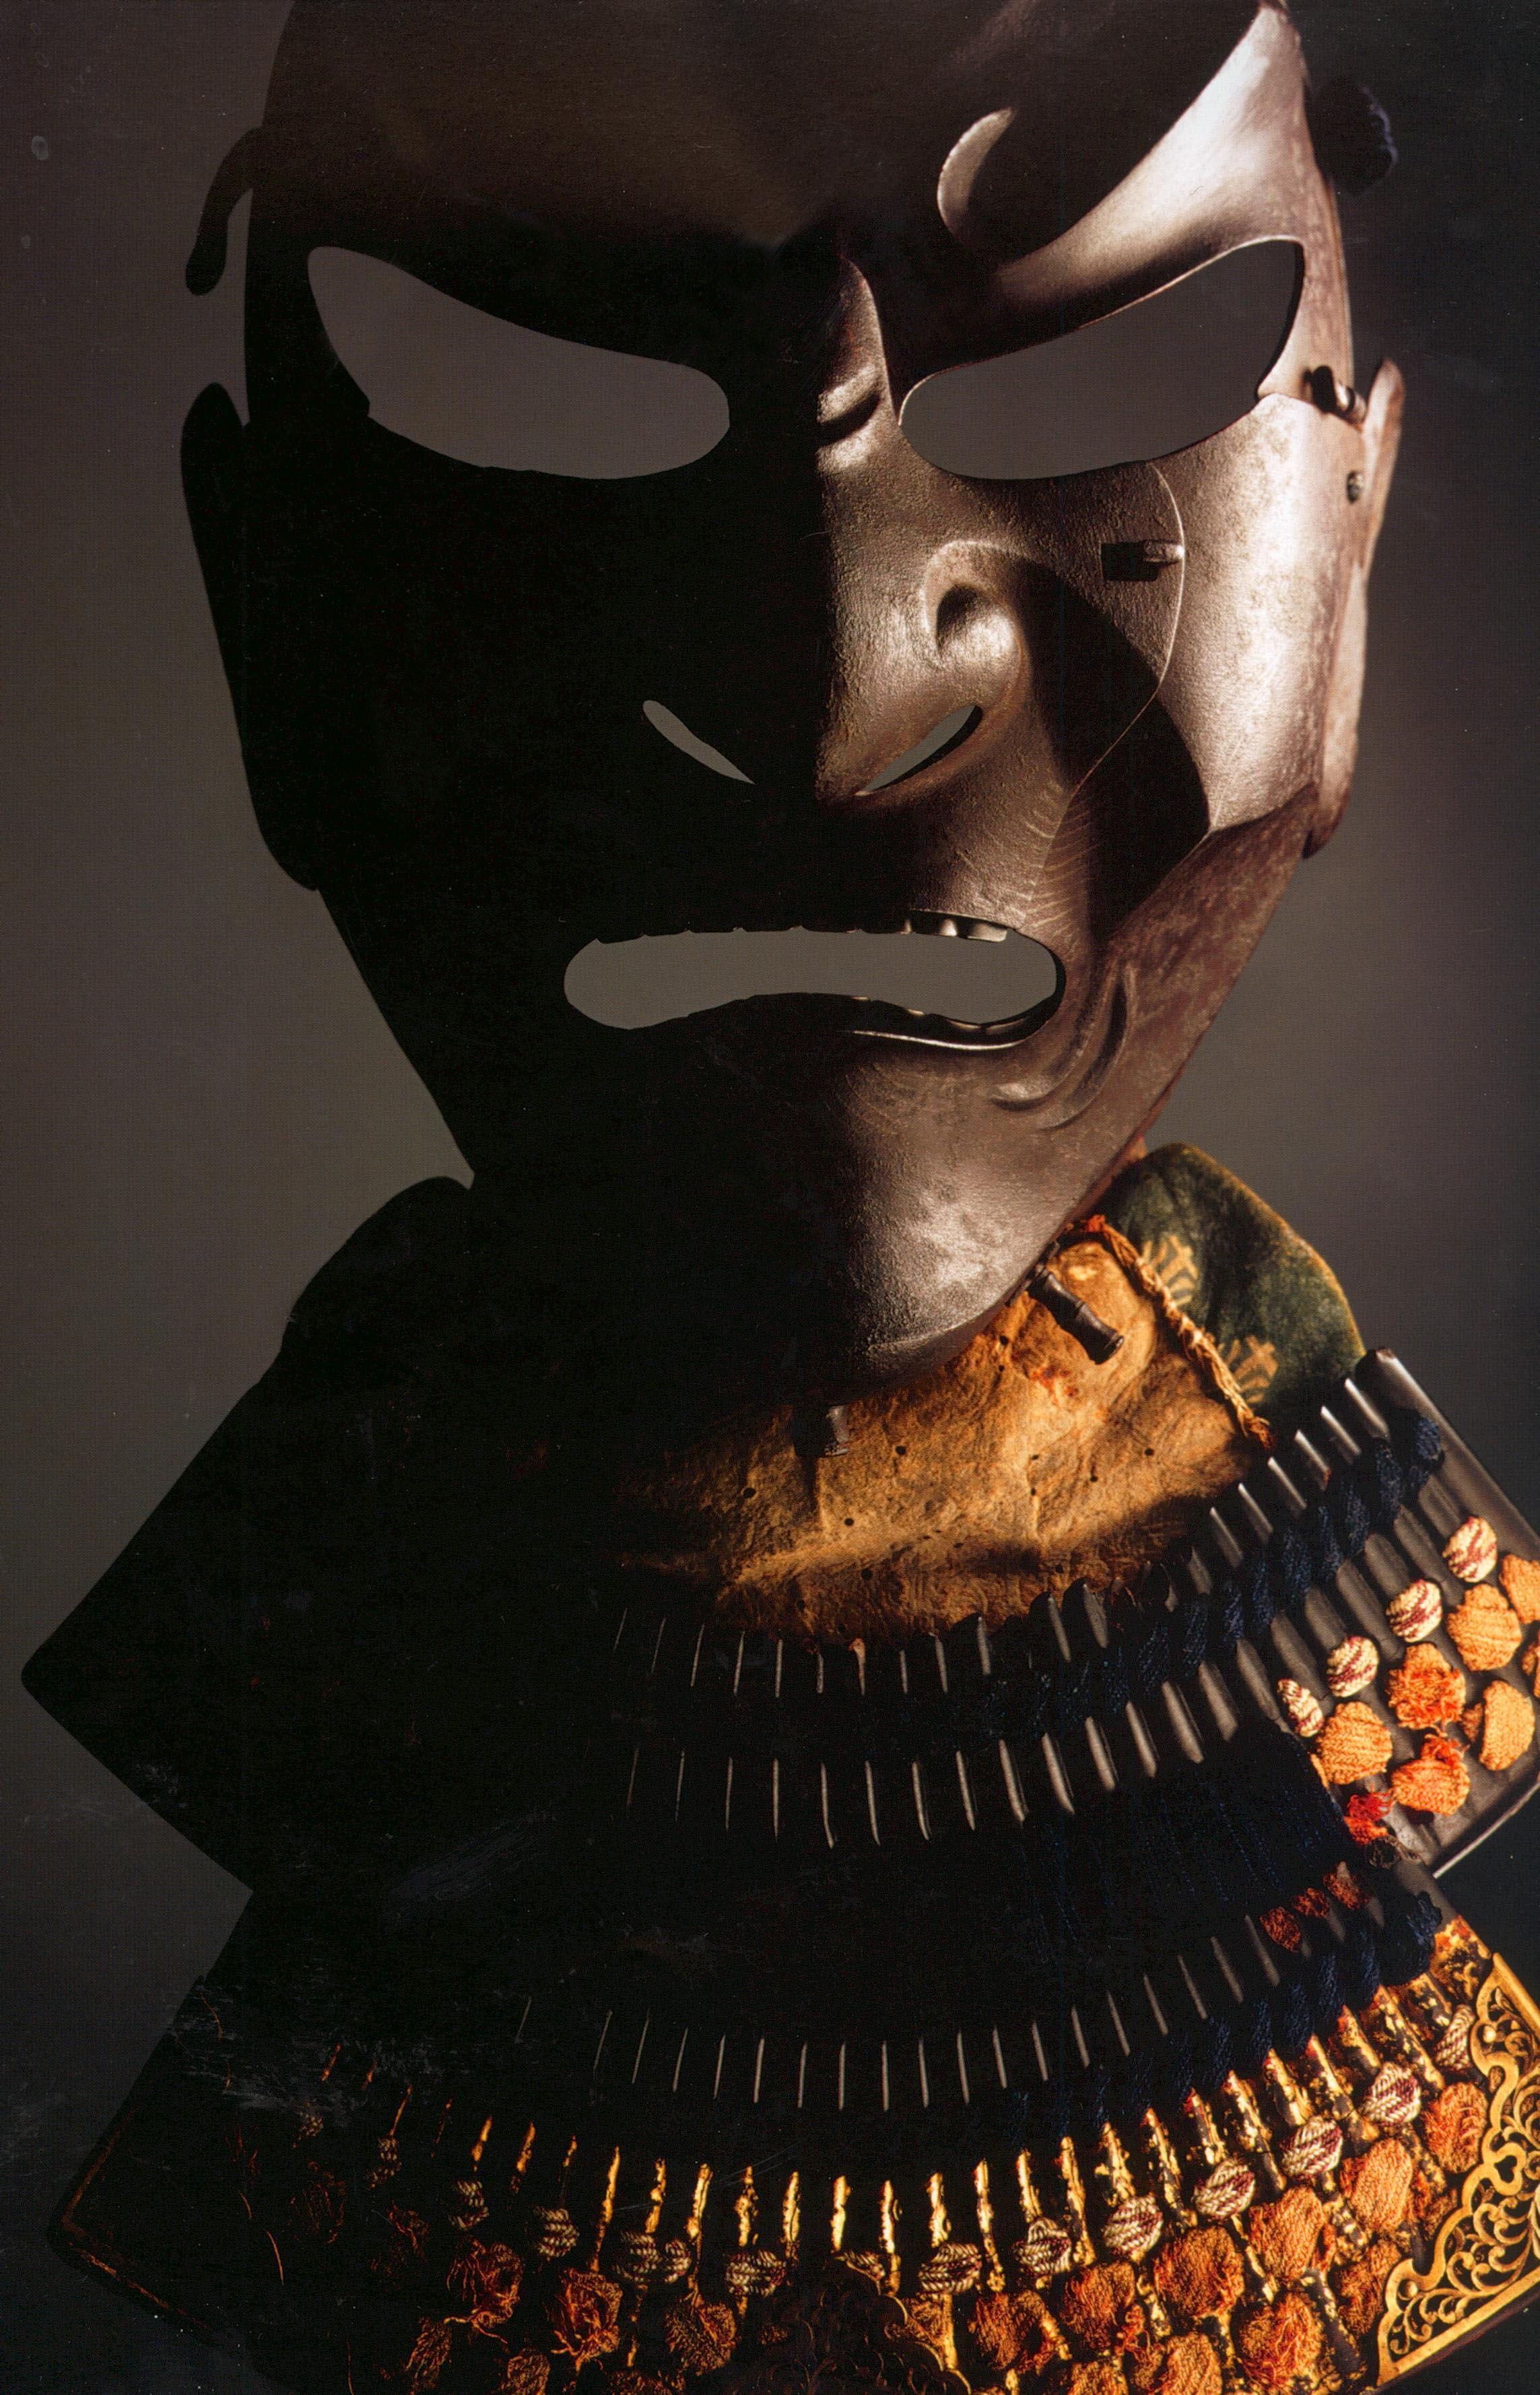 Samurai Mask (detail of armor)